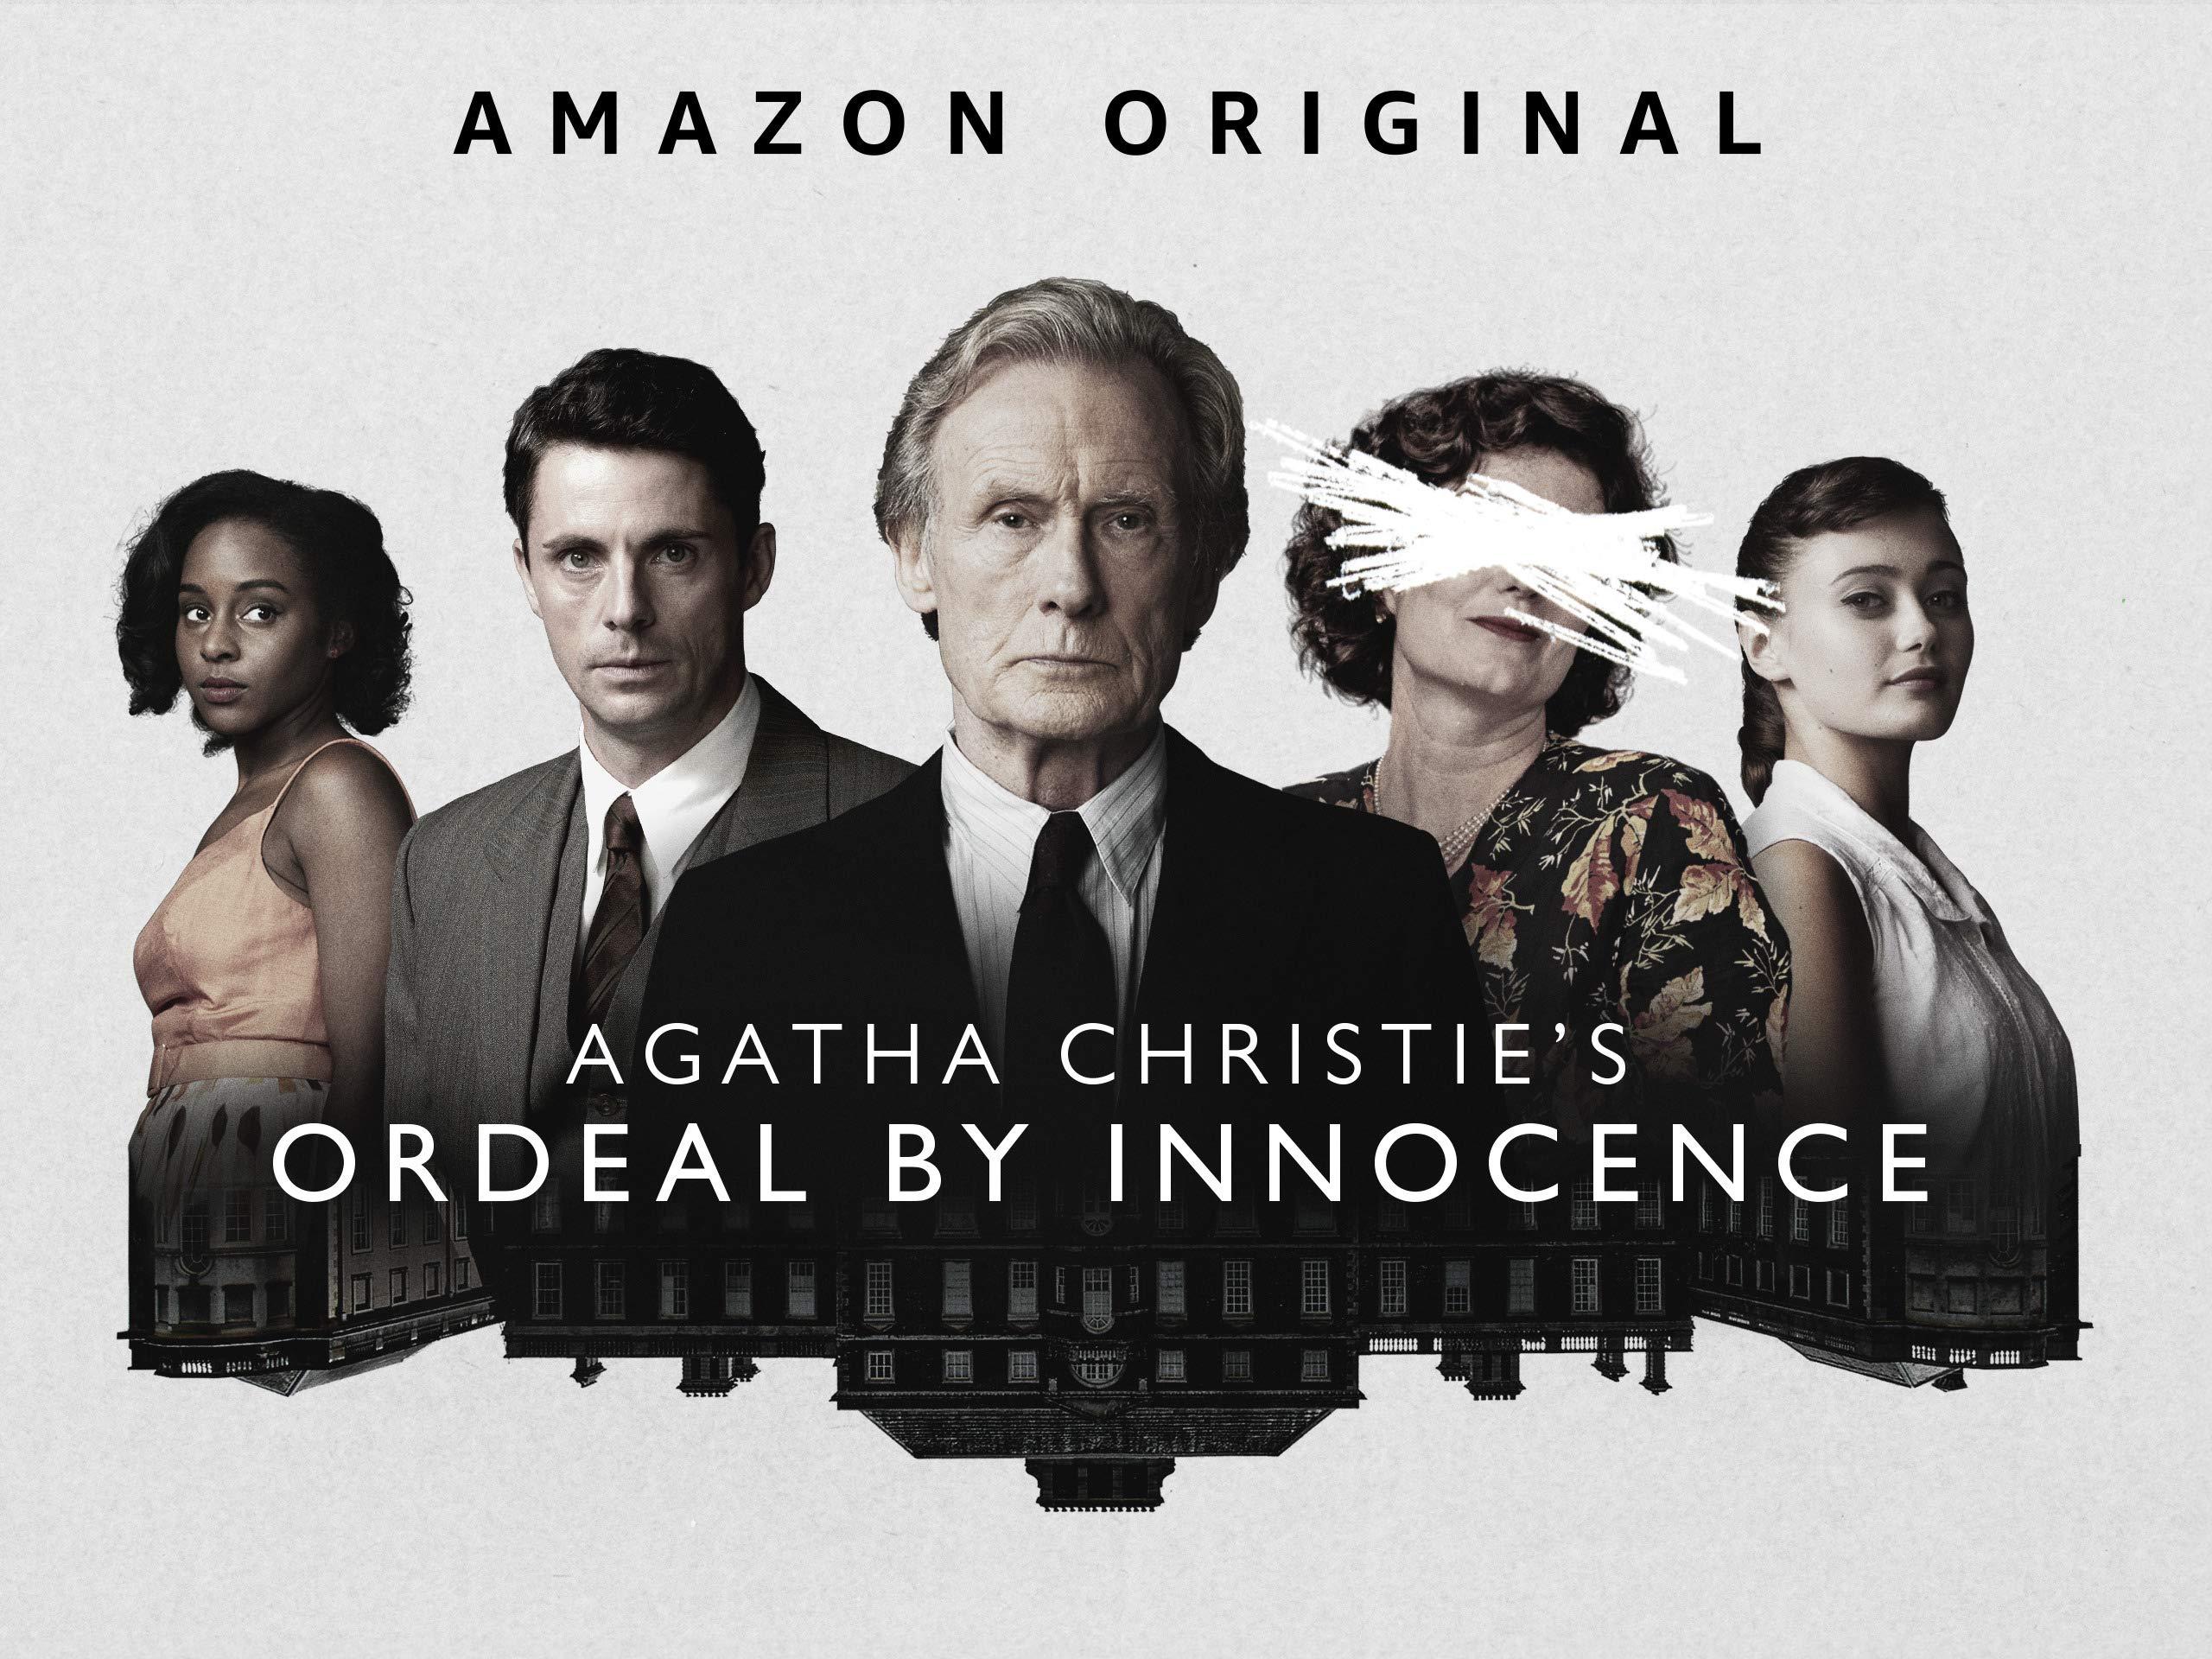 Amazon.com: Ordeal By Innocence - Season 1: Bill Nighy, Anthony ...